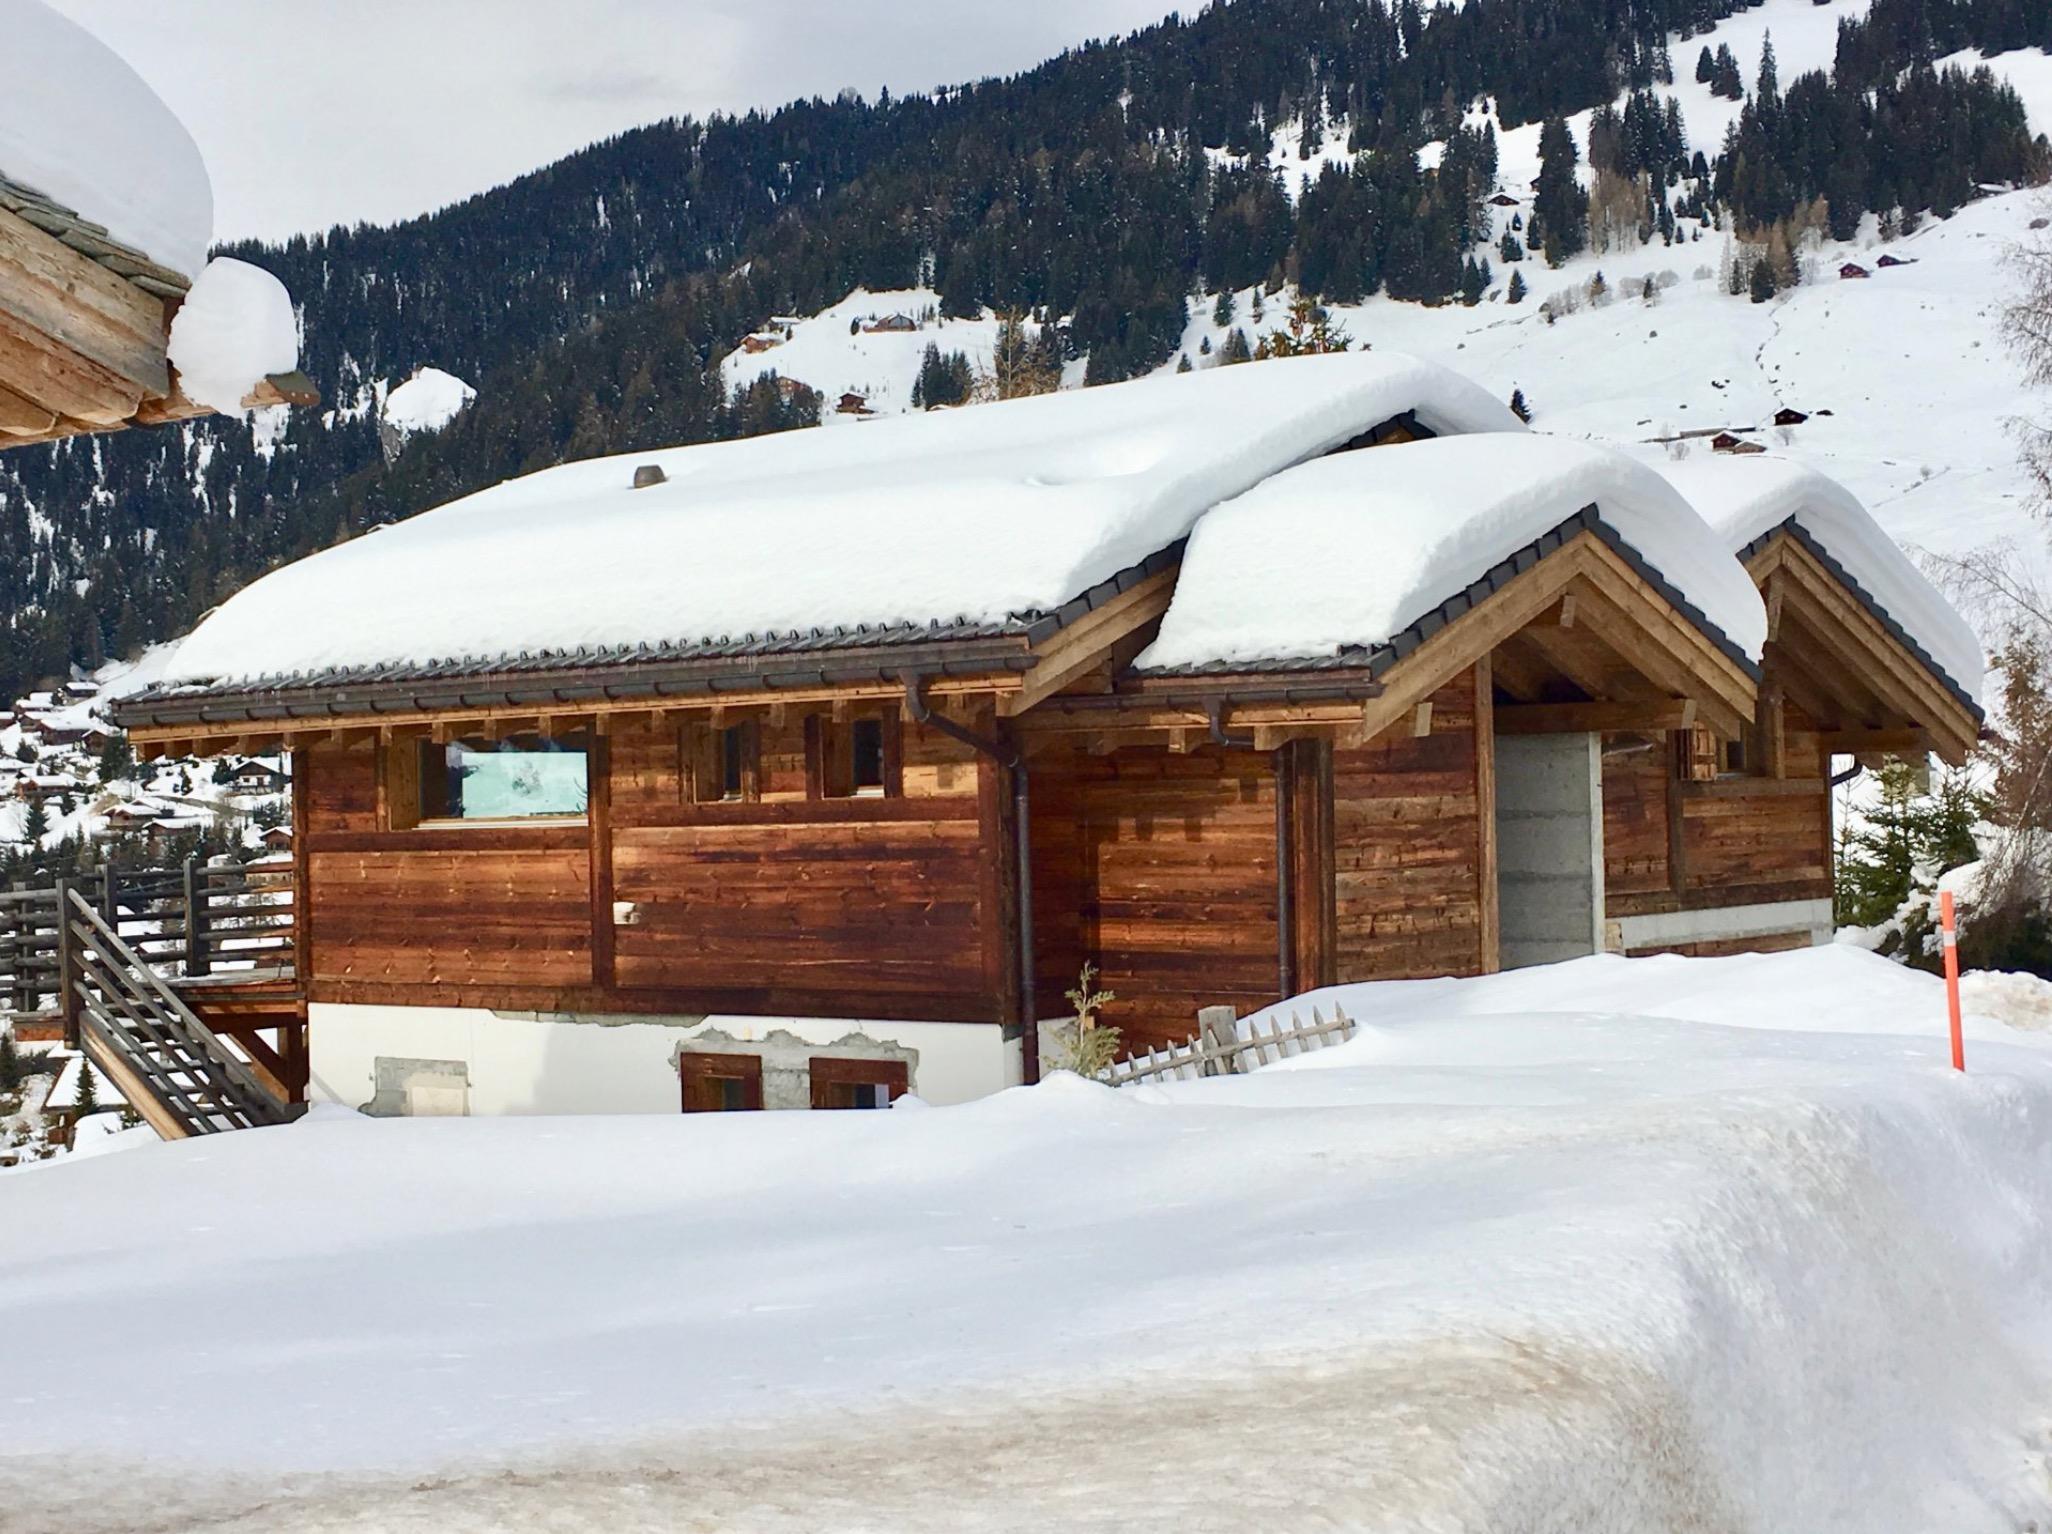 Winter chalet IV verbier full snow seen